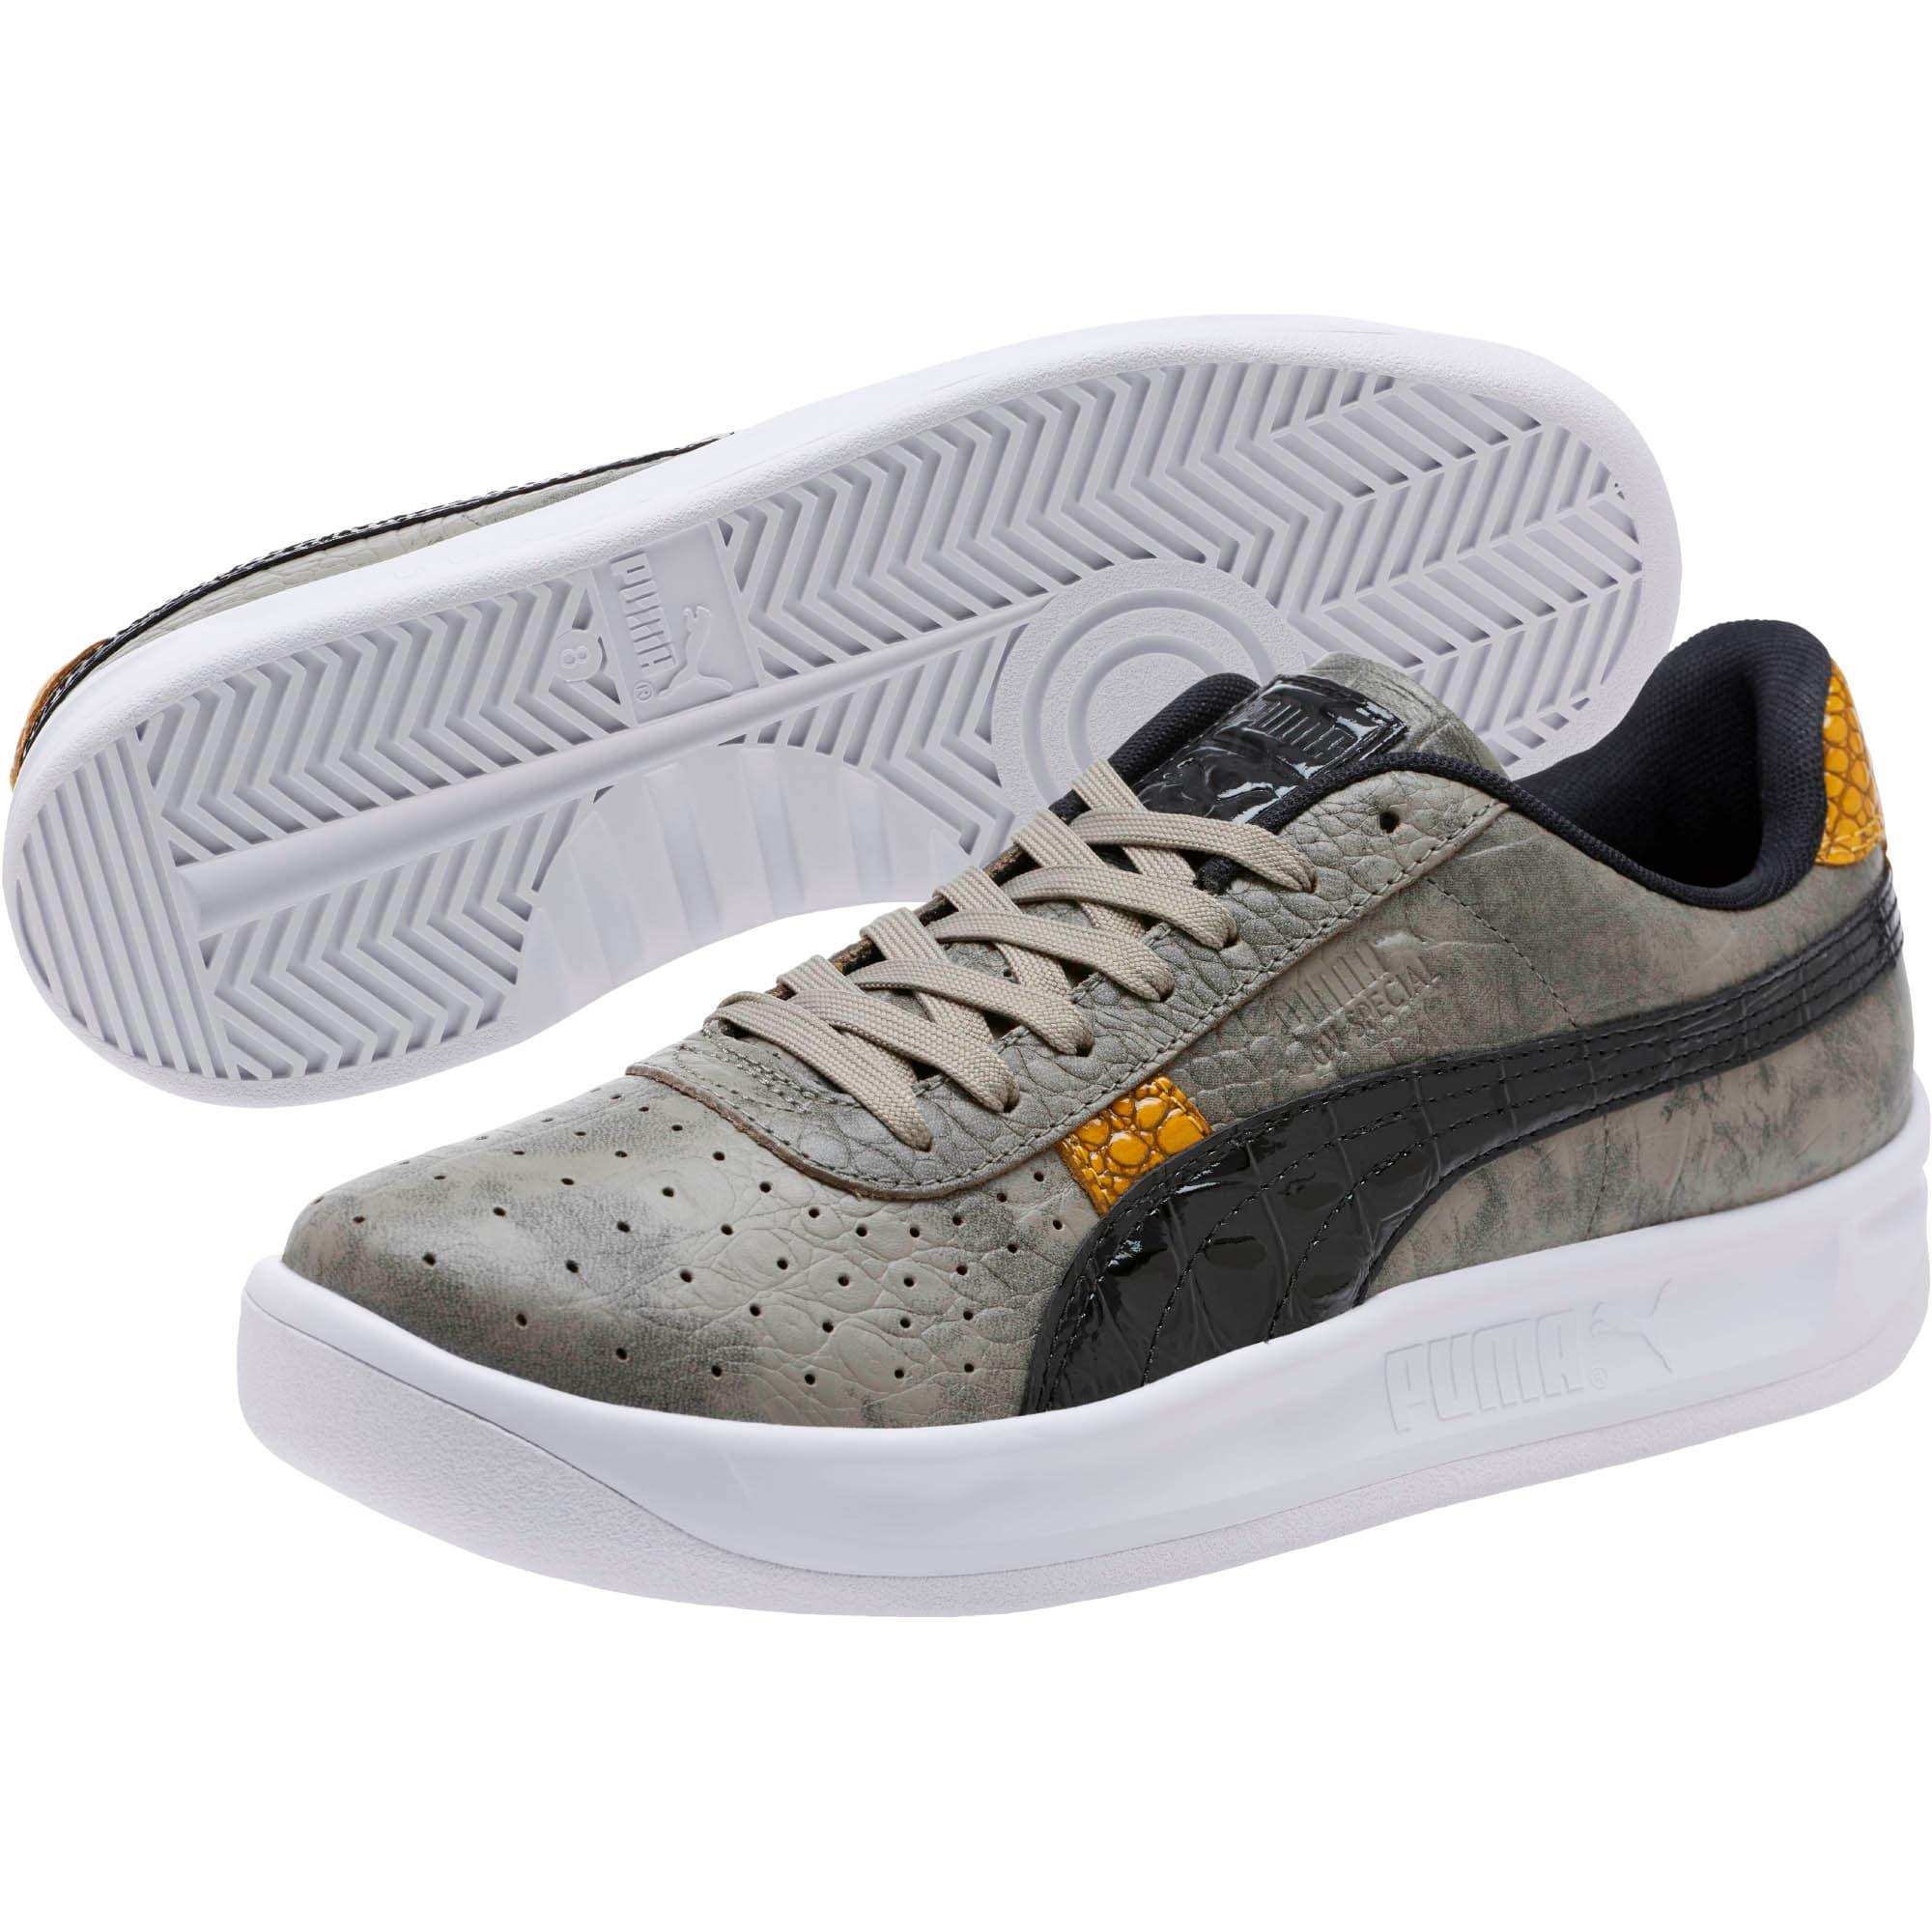 Thumbnail 2 of GV Special+ Gator Gray Men's Sneakers, Elephant Skin-Puma Black, medium